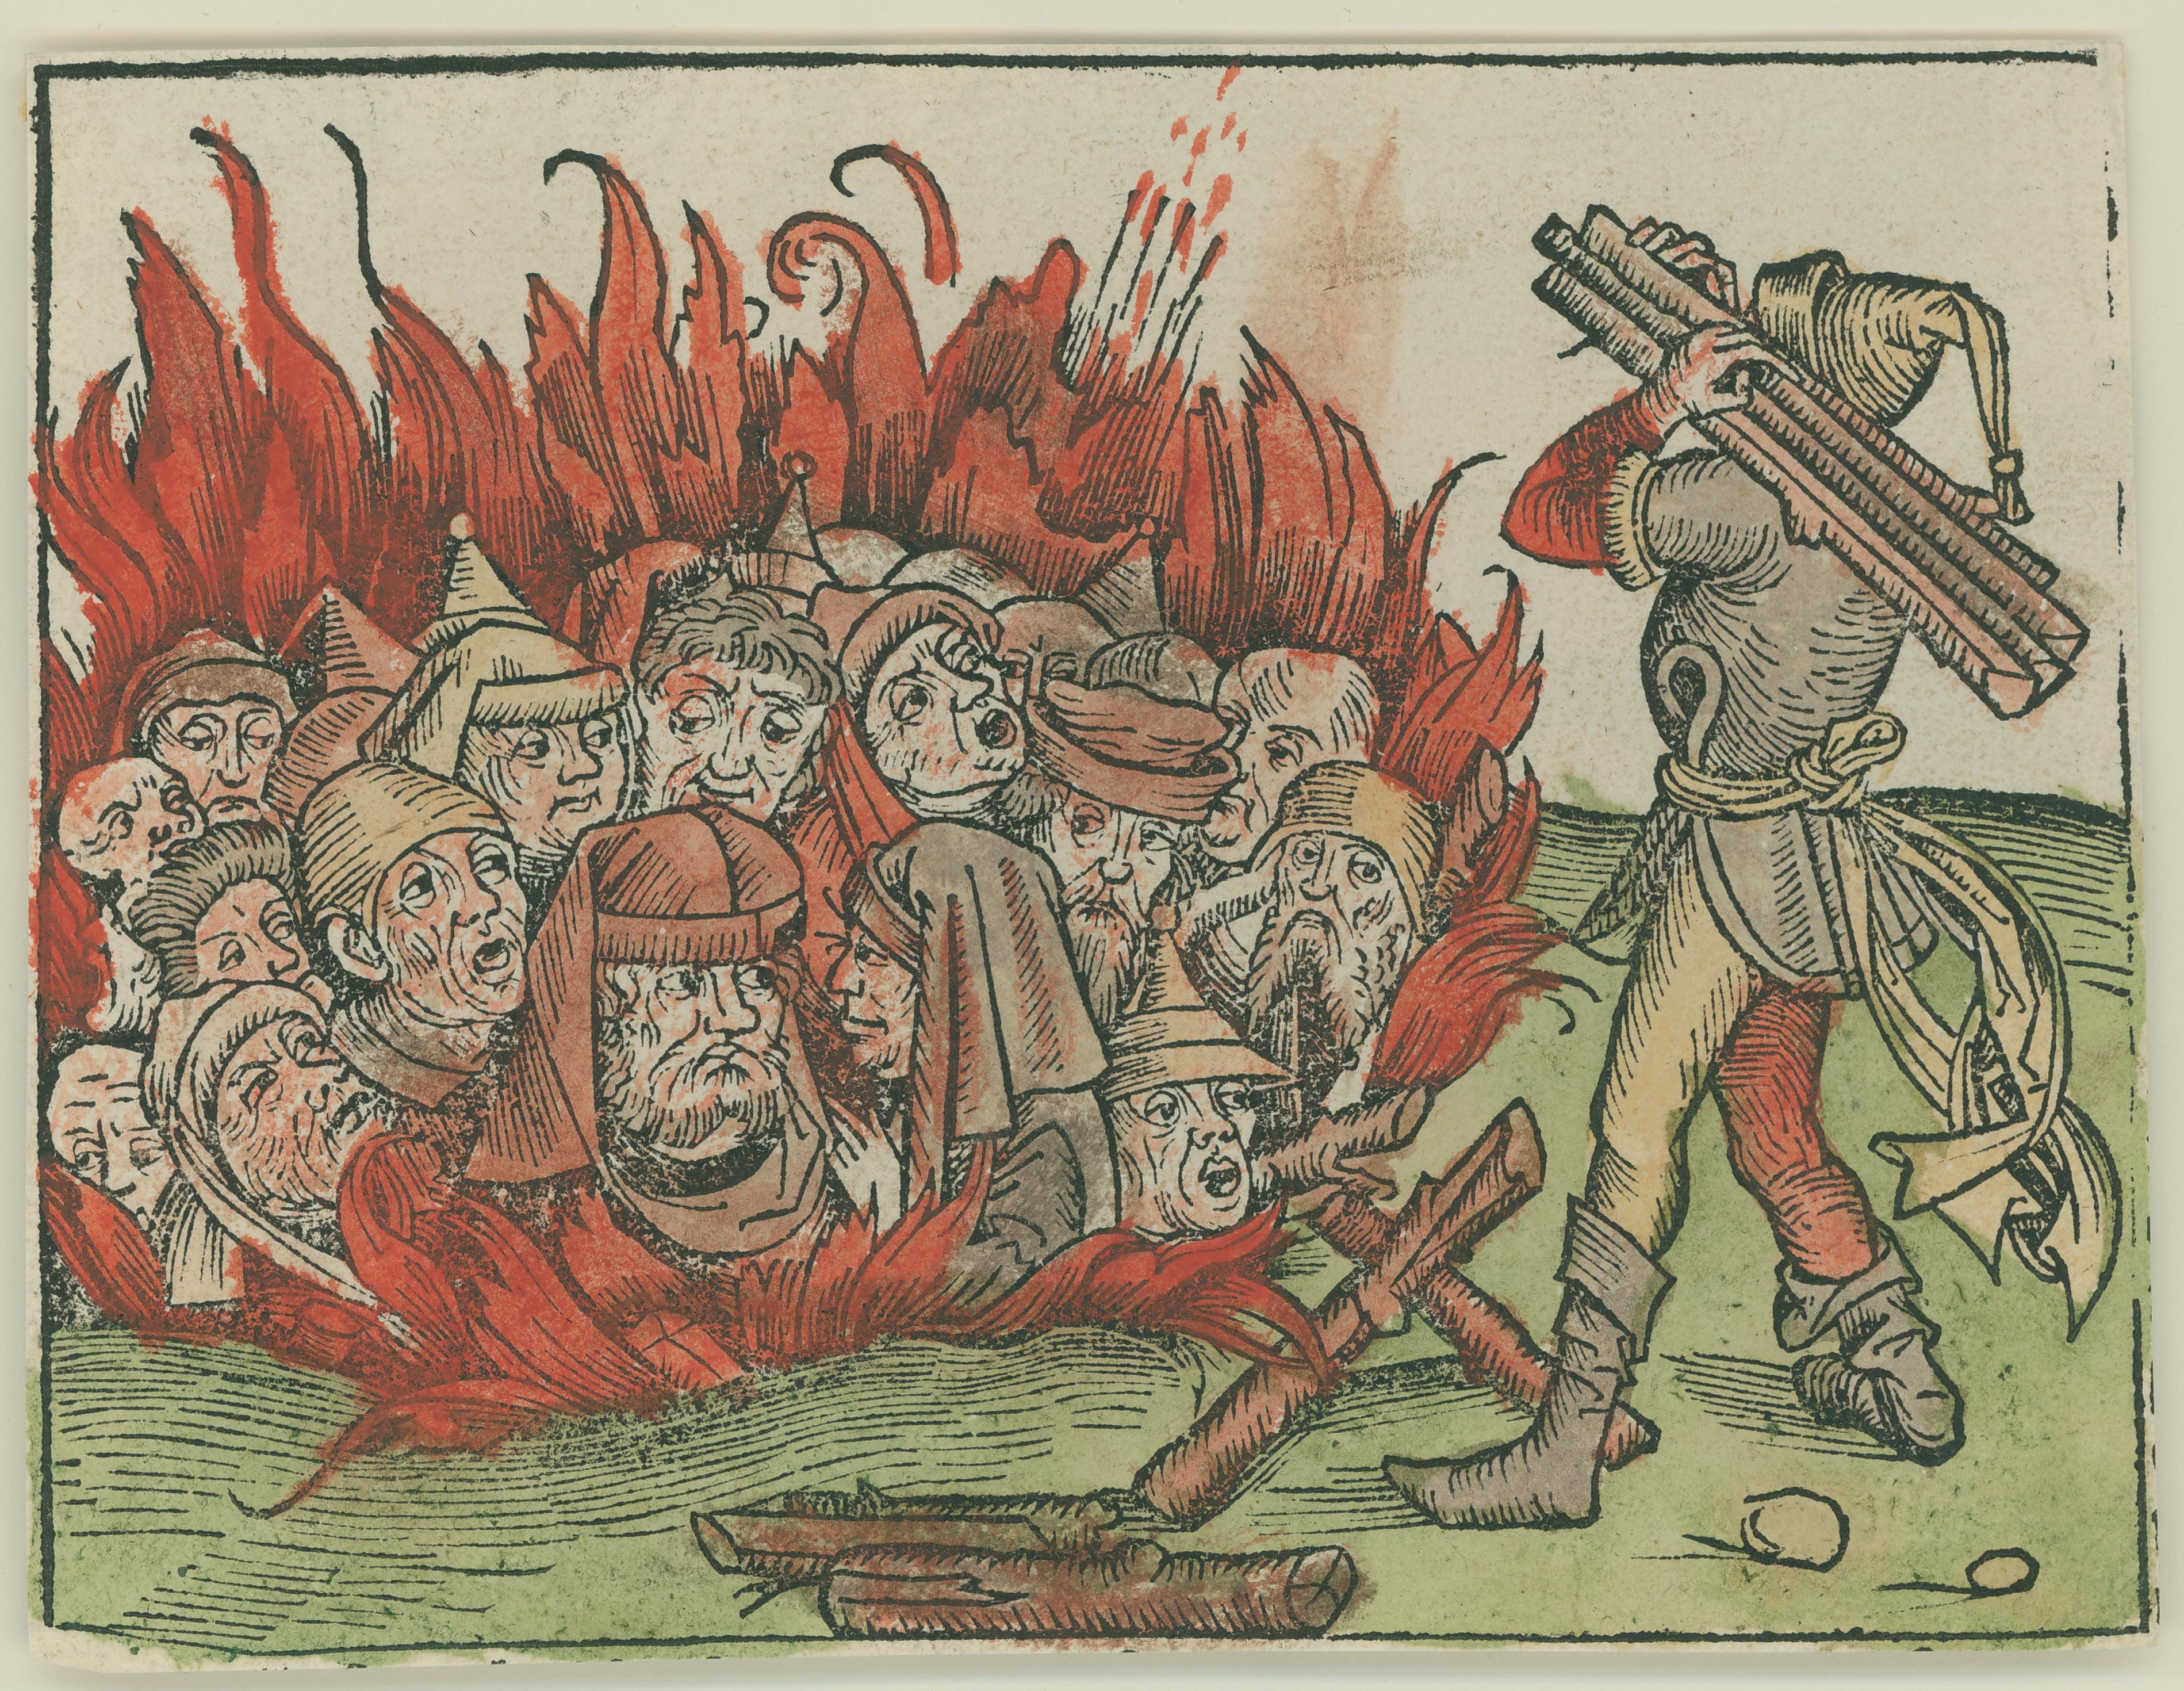 Michael Wolgemut, <i>Untitled</i>, woodcut on paper, 1453